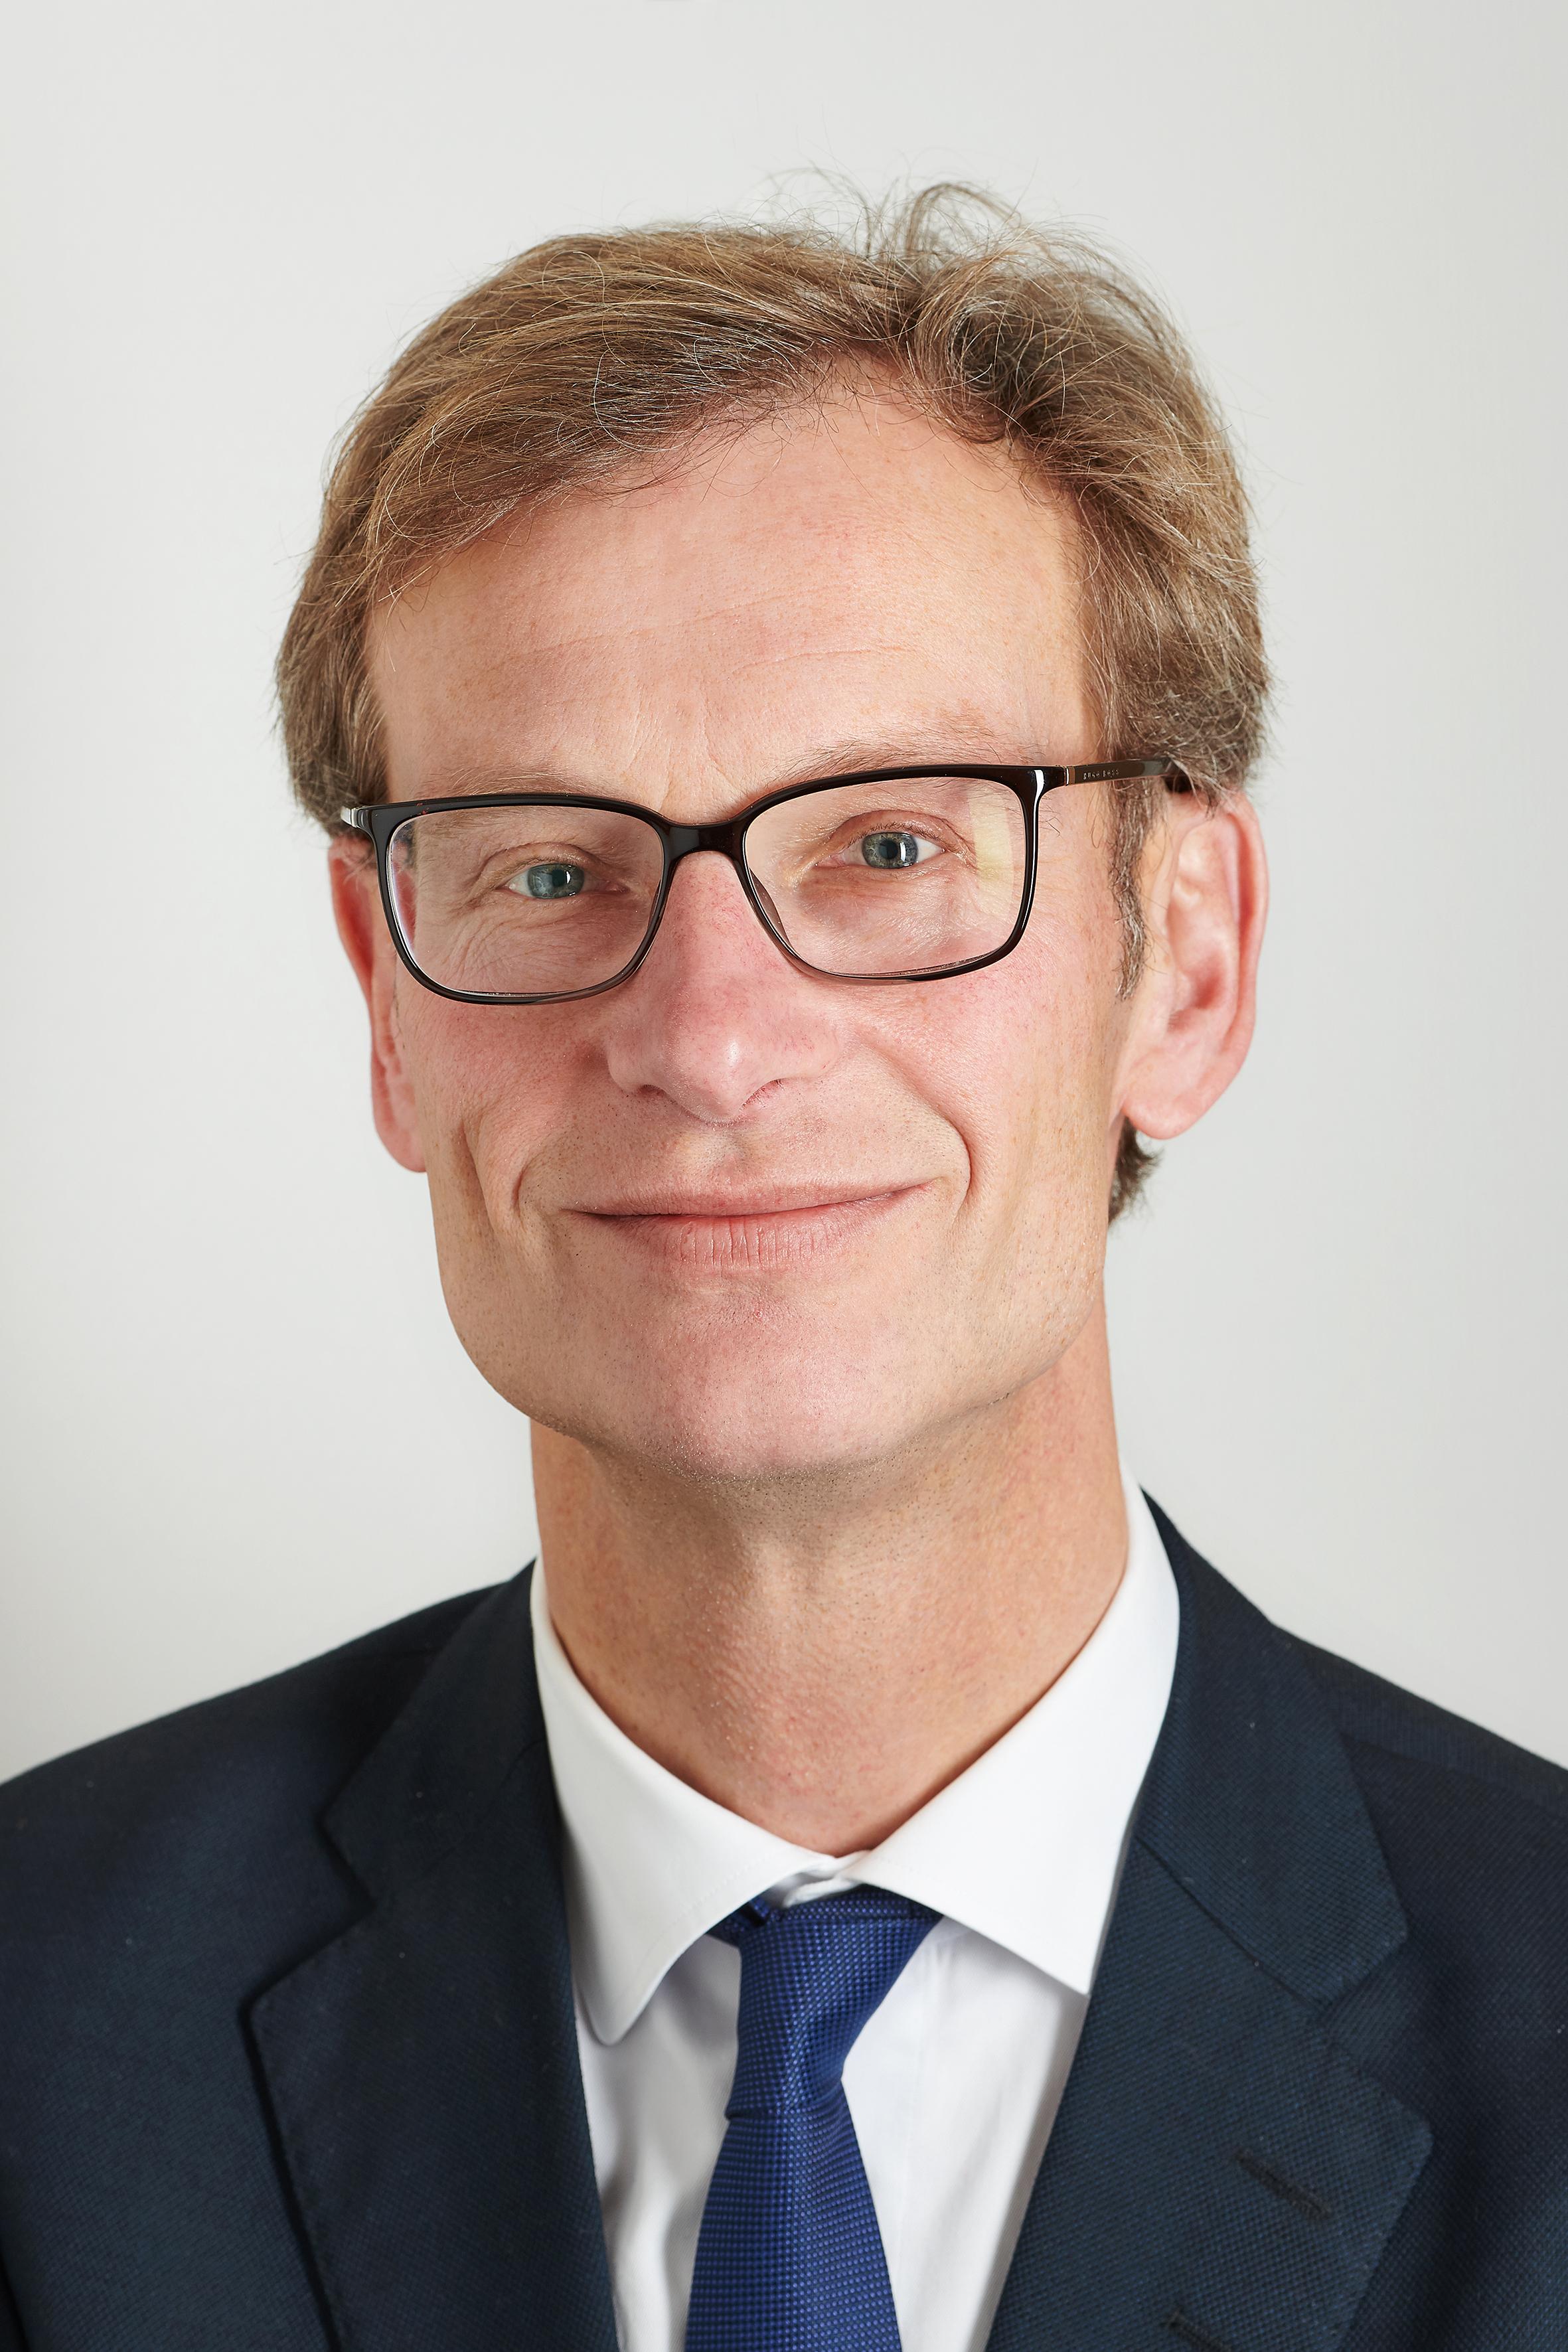 Fredrik W. Knudsen